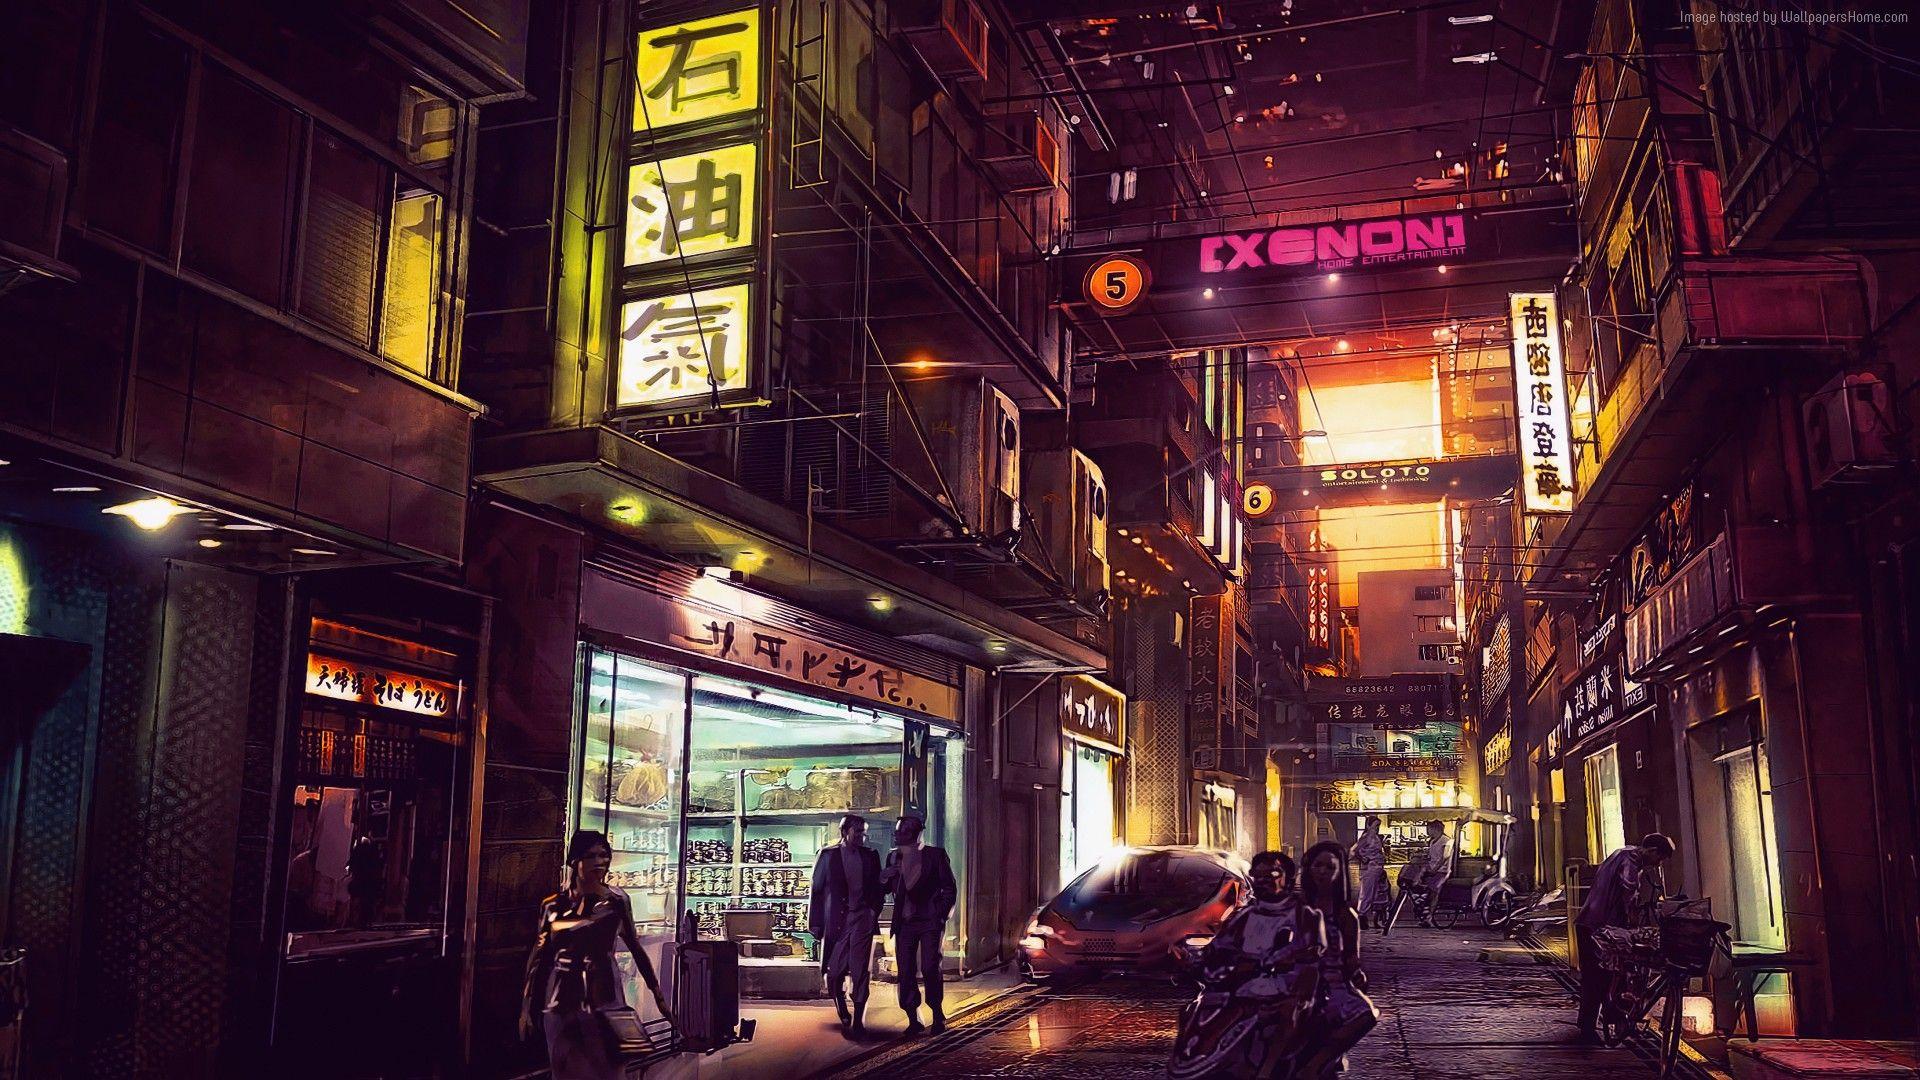 4k Wallpapers Hd Wallpapers Artwork Art Scifi Cyberpunk Neon City Futuristic Futuristic City Digital Wallpaper Cyberpunk